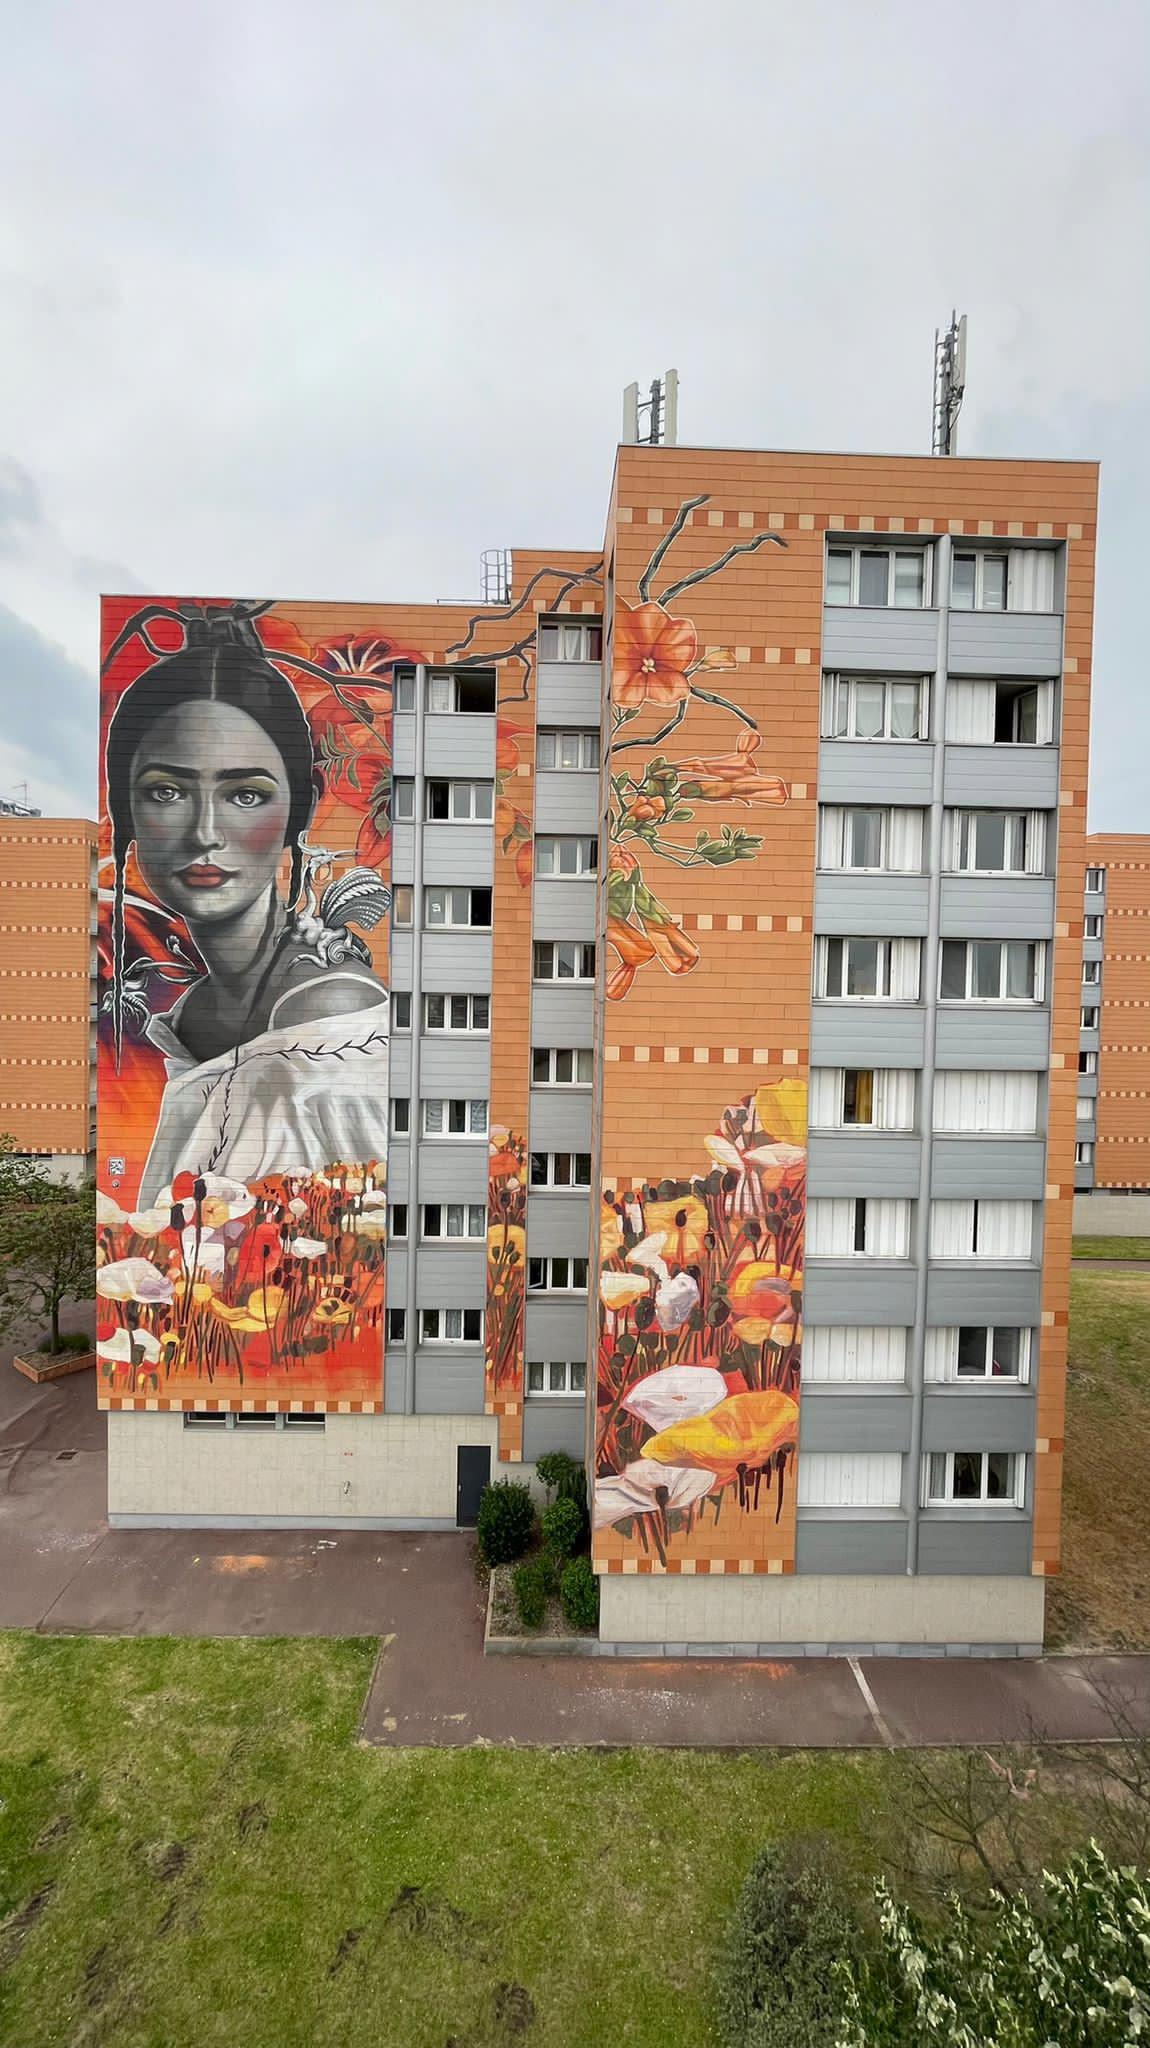 arte urbano Mural streeart